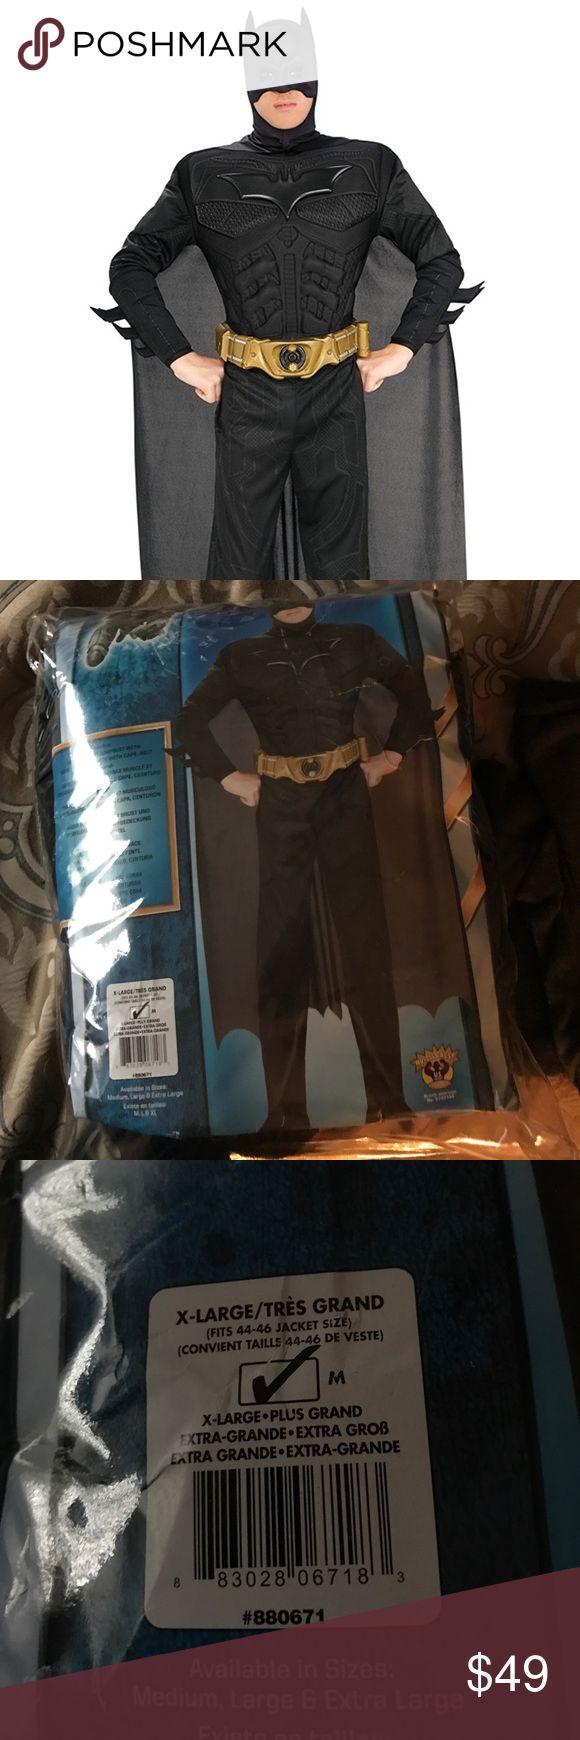 Fashion of the bat an extremely thorough examination of batman s - New X Large Batman Costume Adult New X Large Batman Costume